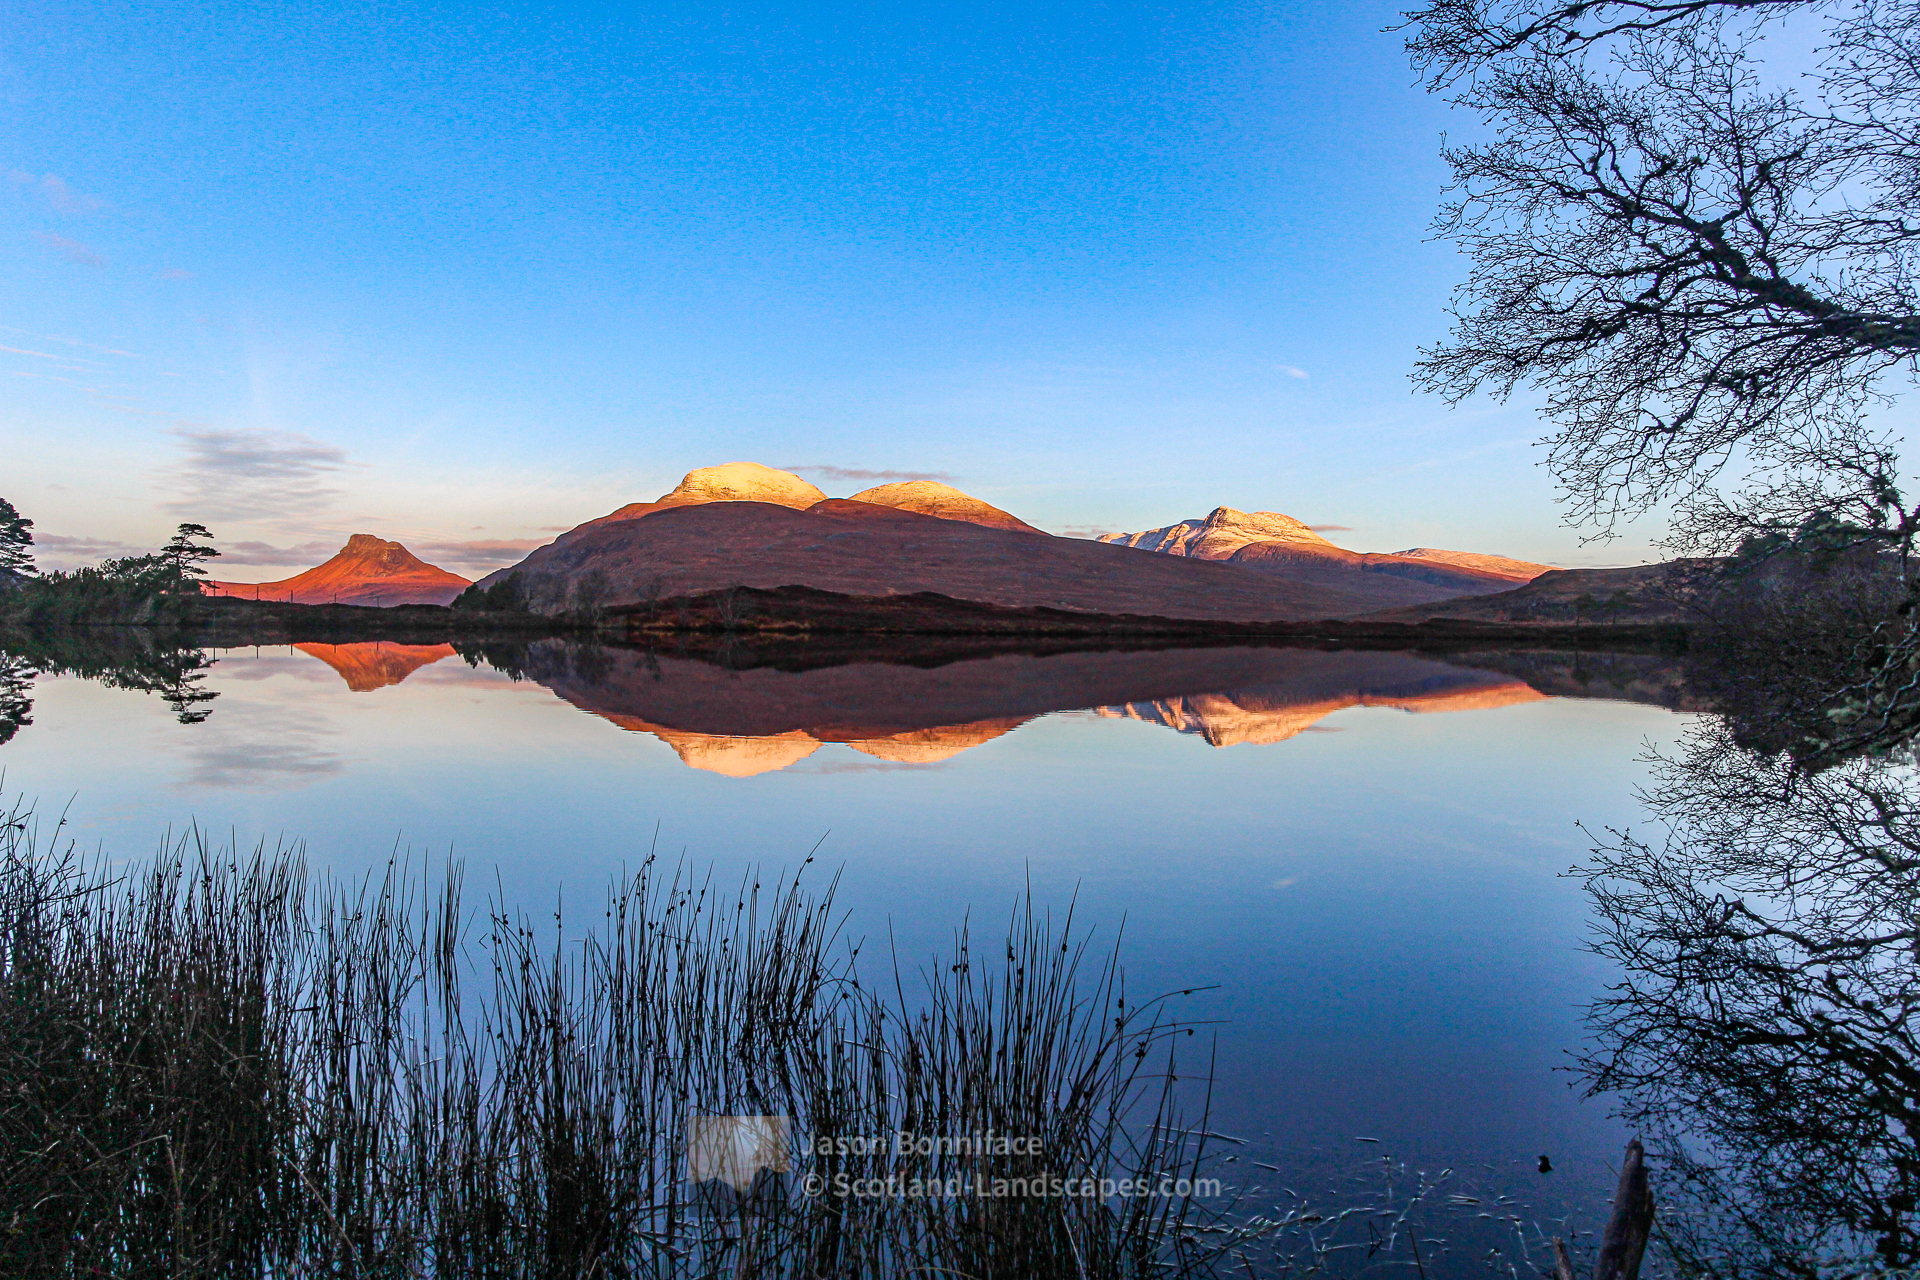 Morning Sunlit Peaks - Stac Pollaidh, Cul Beag and Cul Mor, Assynt & Ullapool